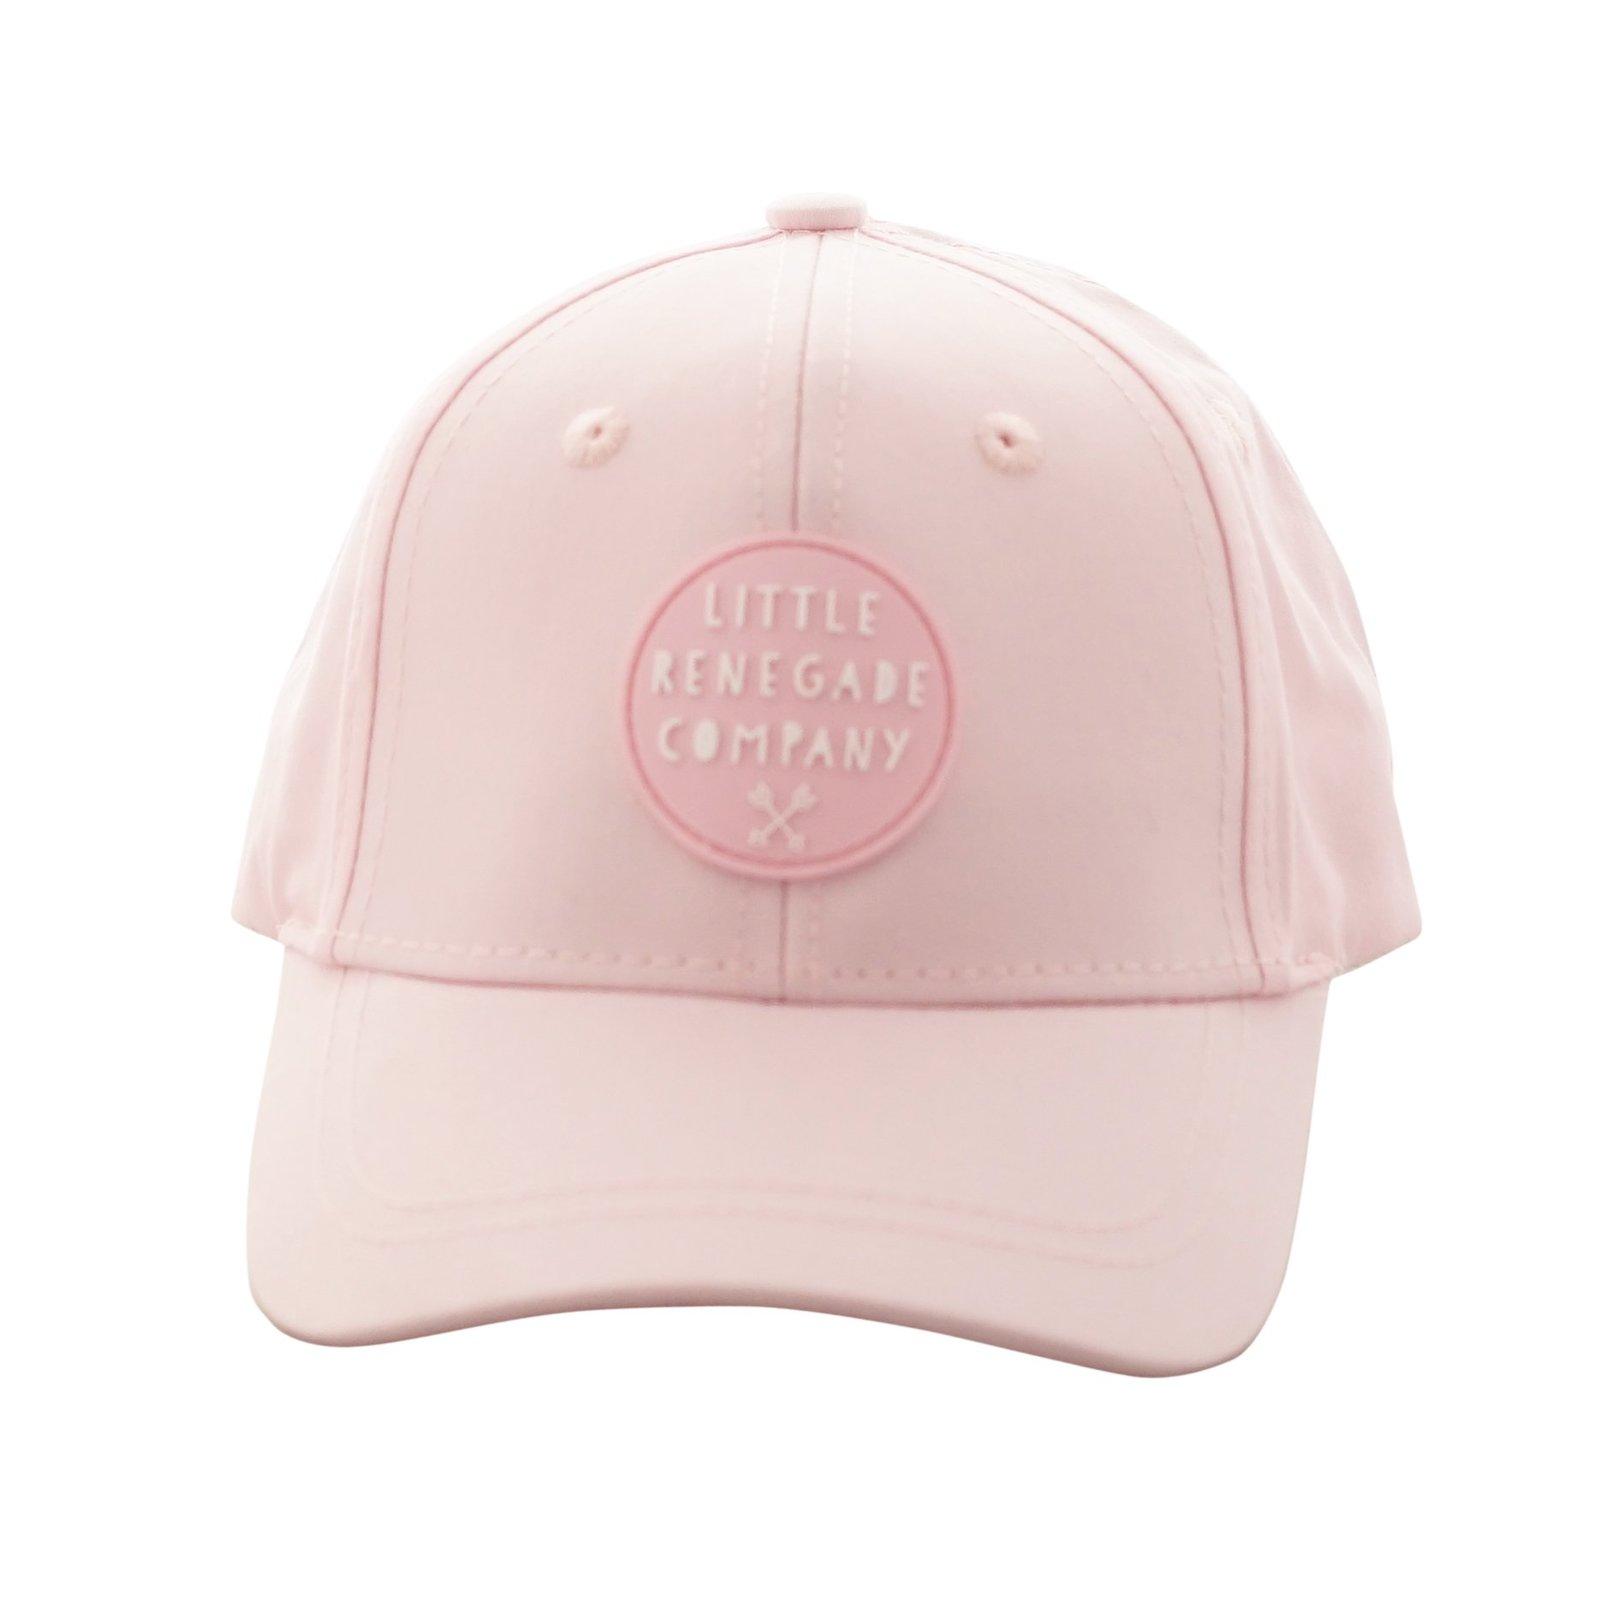 Little Renegade Company: Rose Baseball Cap - Midi image